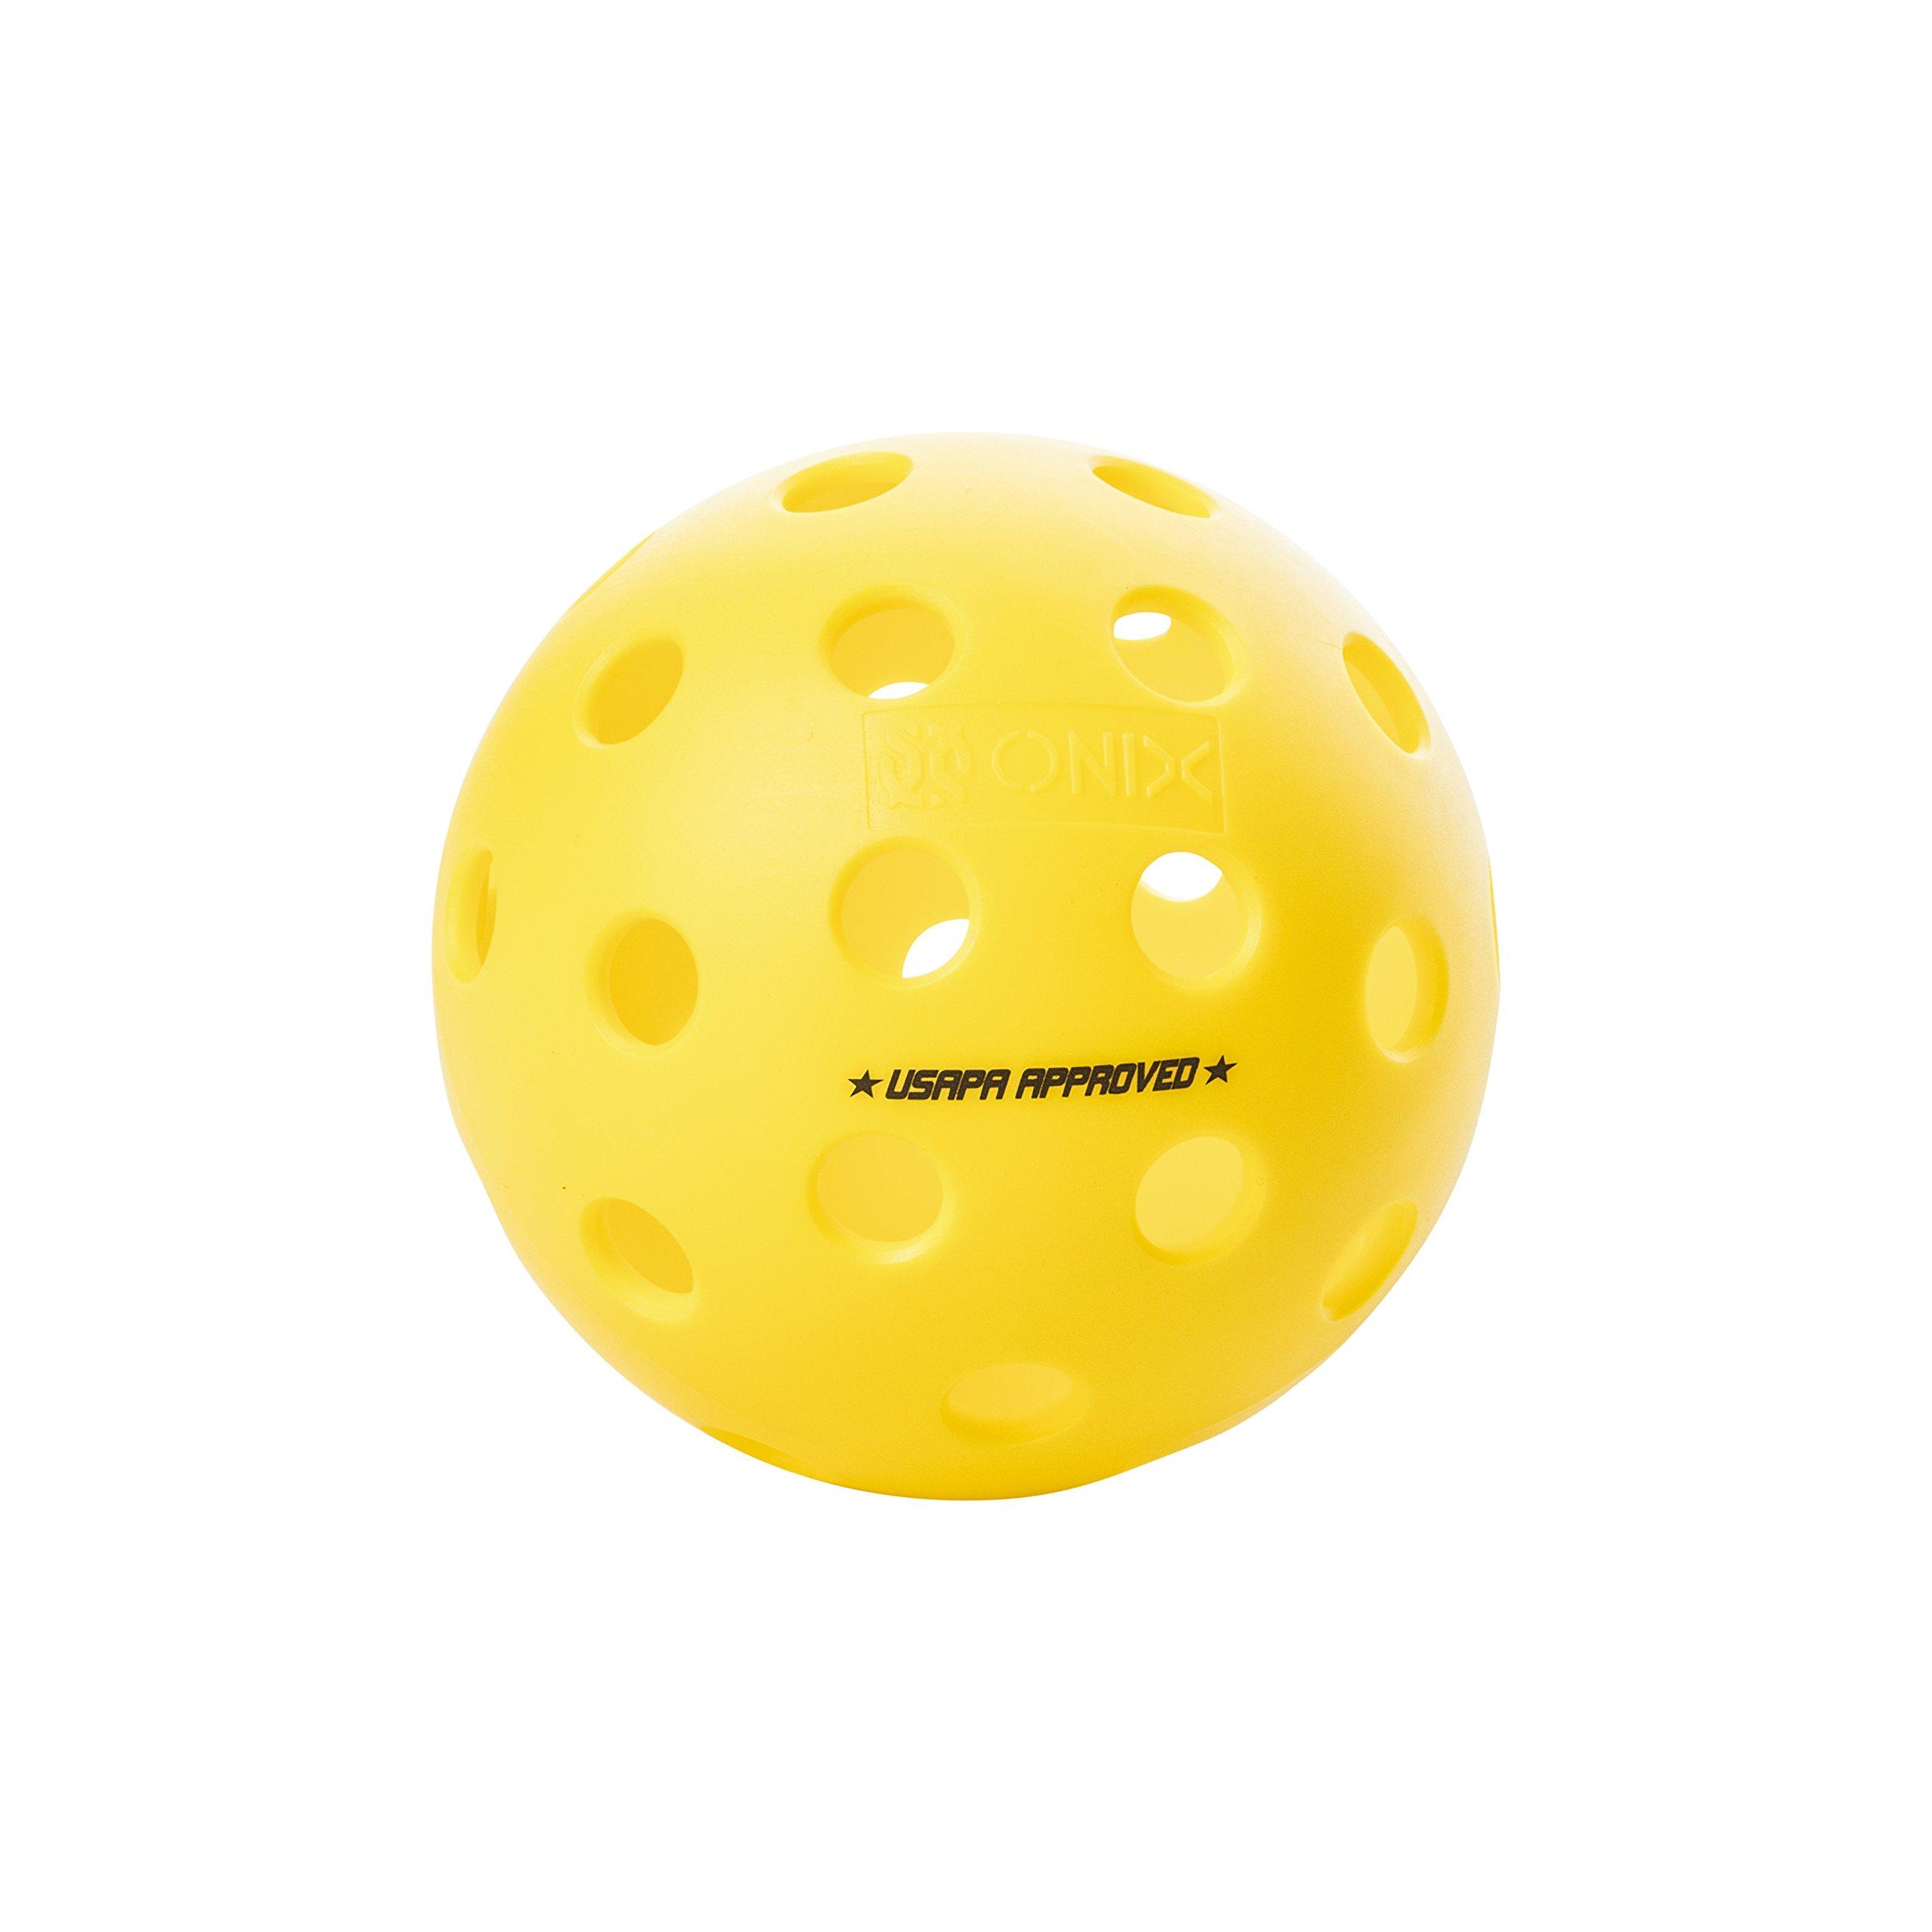 ONIX Fuse Outdoor Pickleball Balls – Three Pack